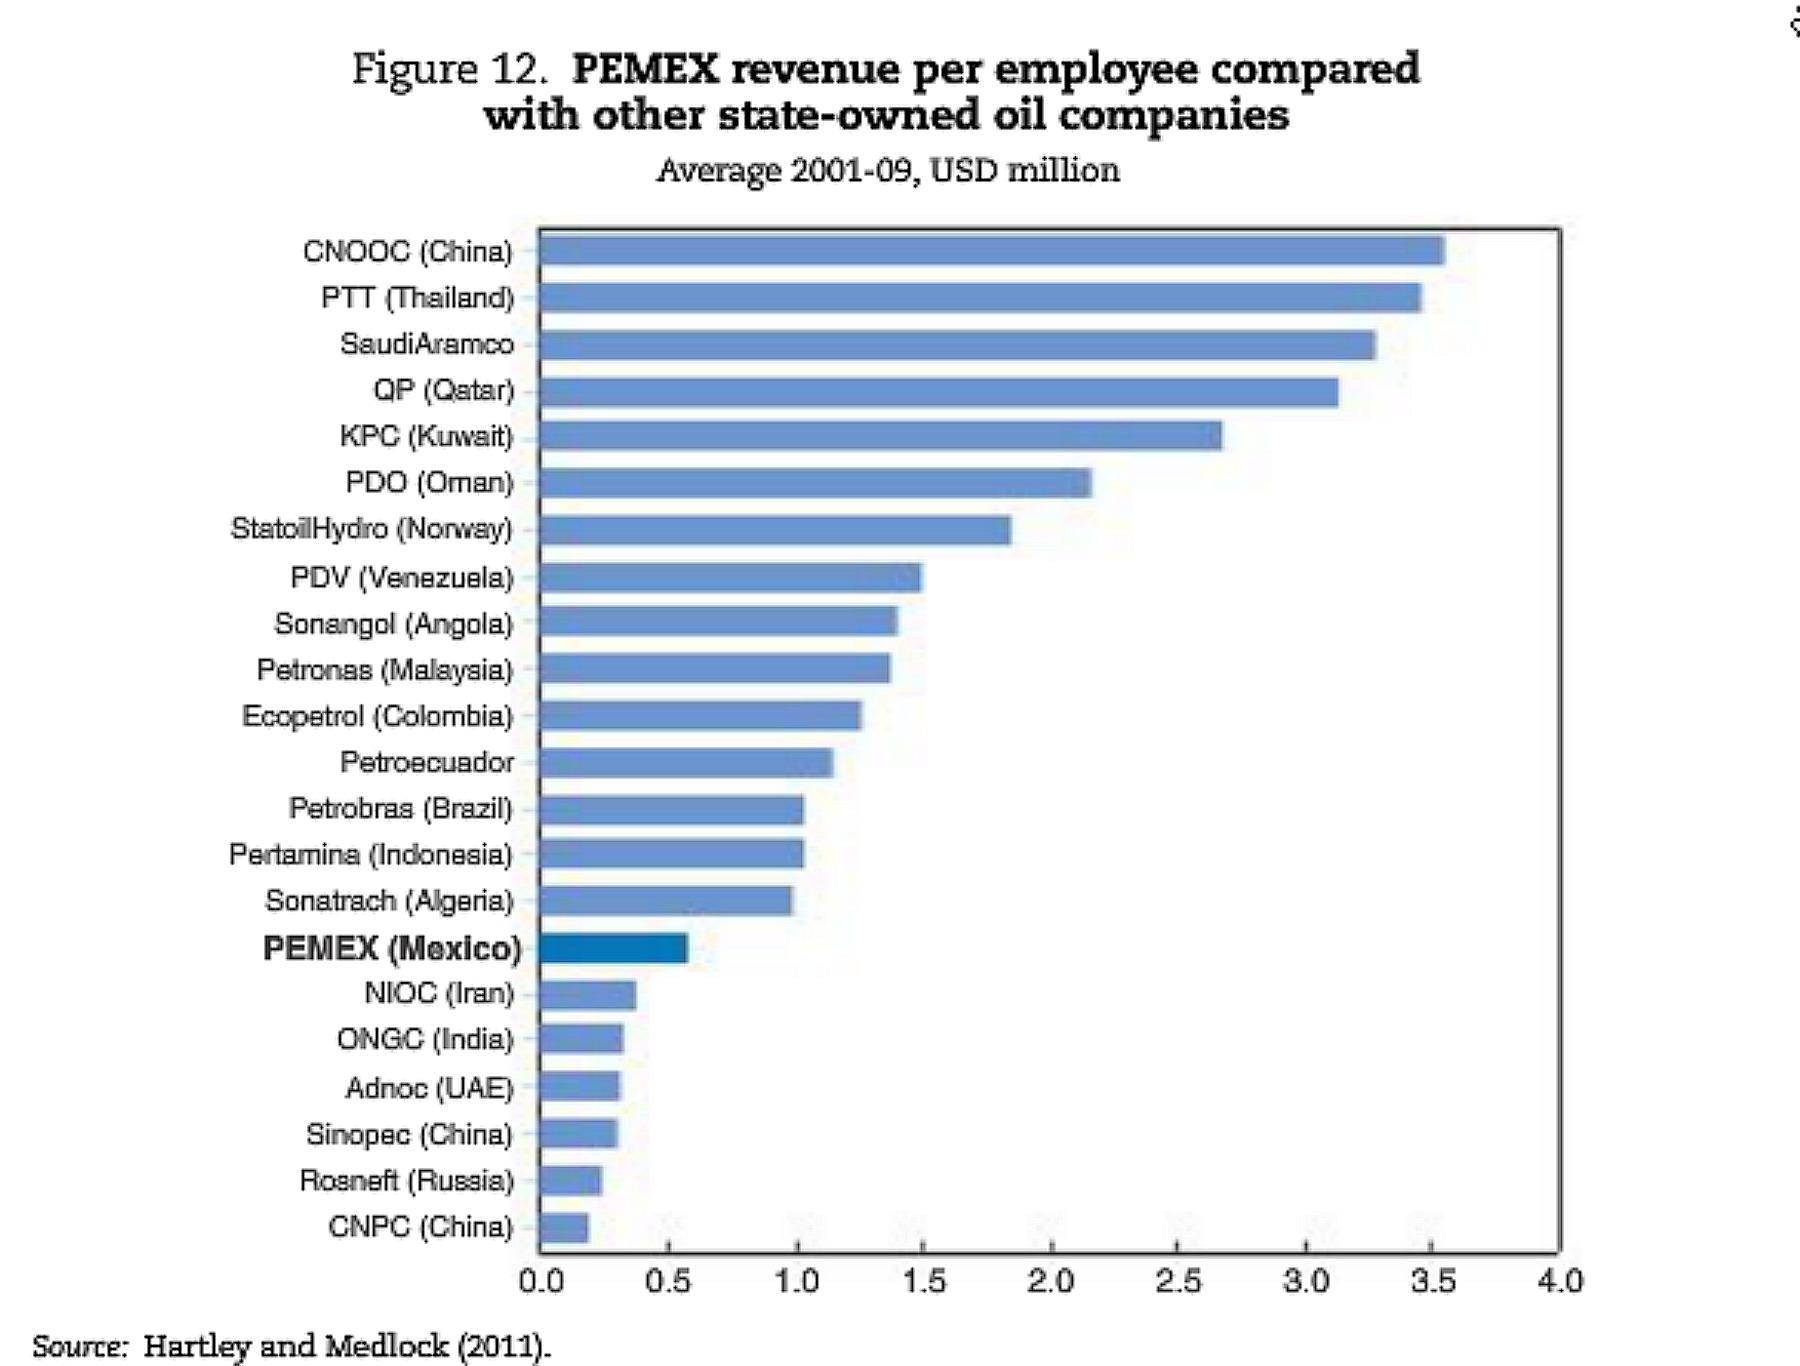 PEMEX revenue per employee